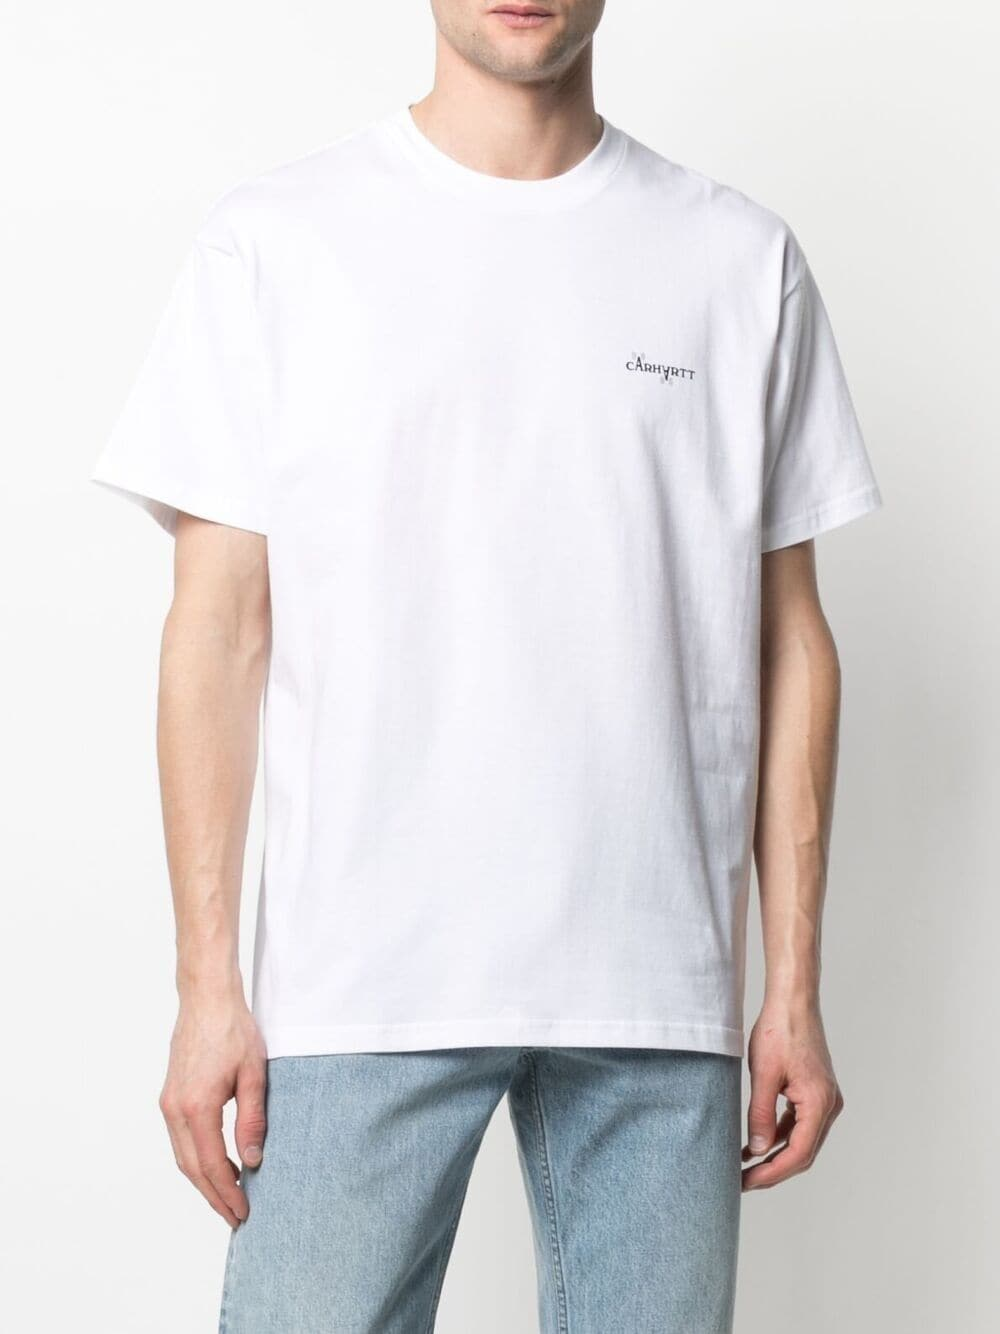 CALIBRATE T-SHIRT CARHARTT WIP | T-shirts | I02901702.00